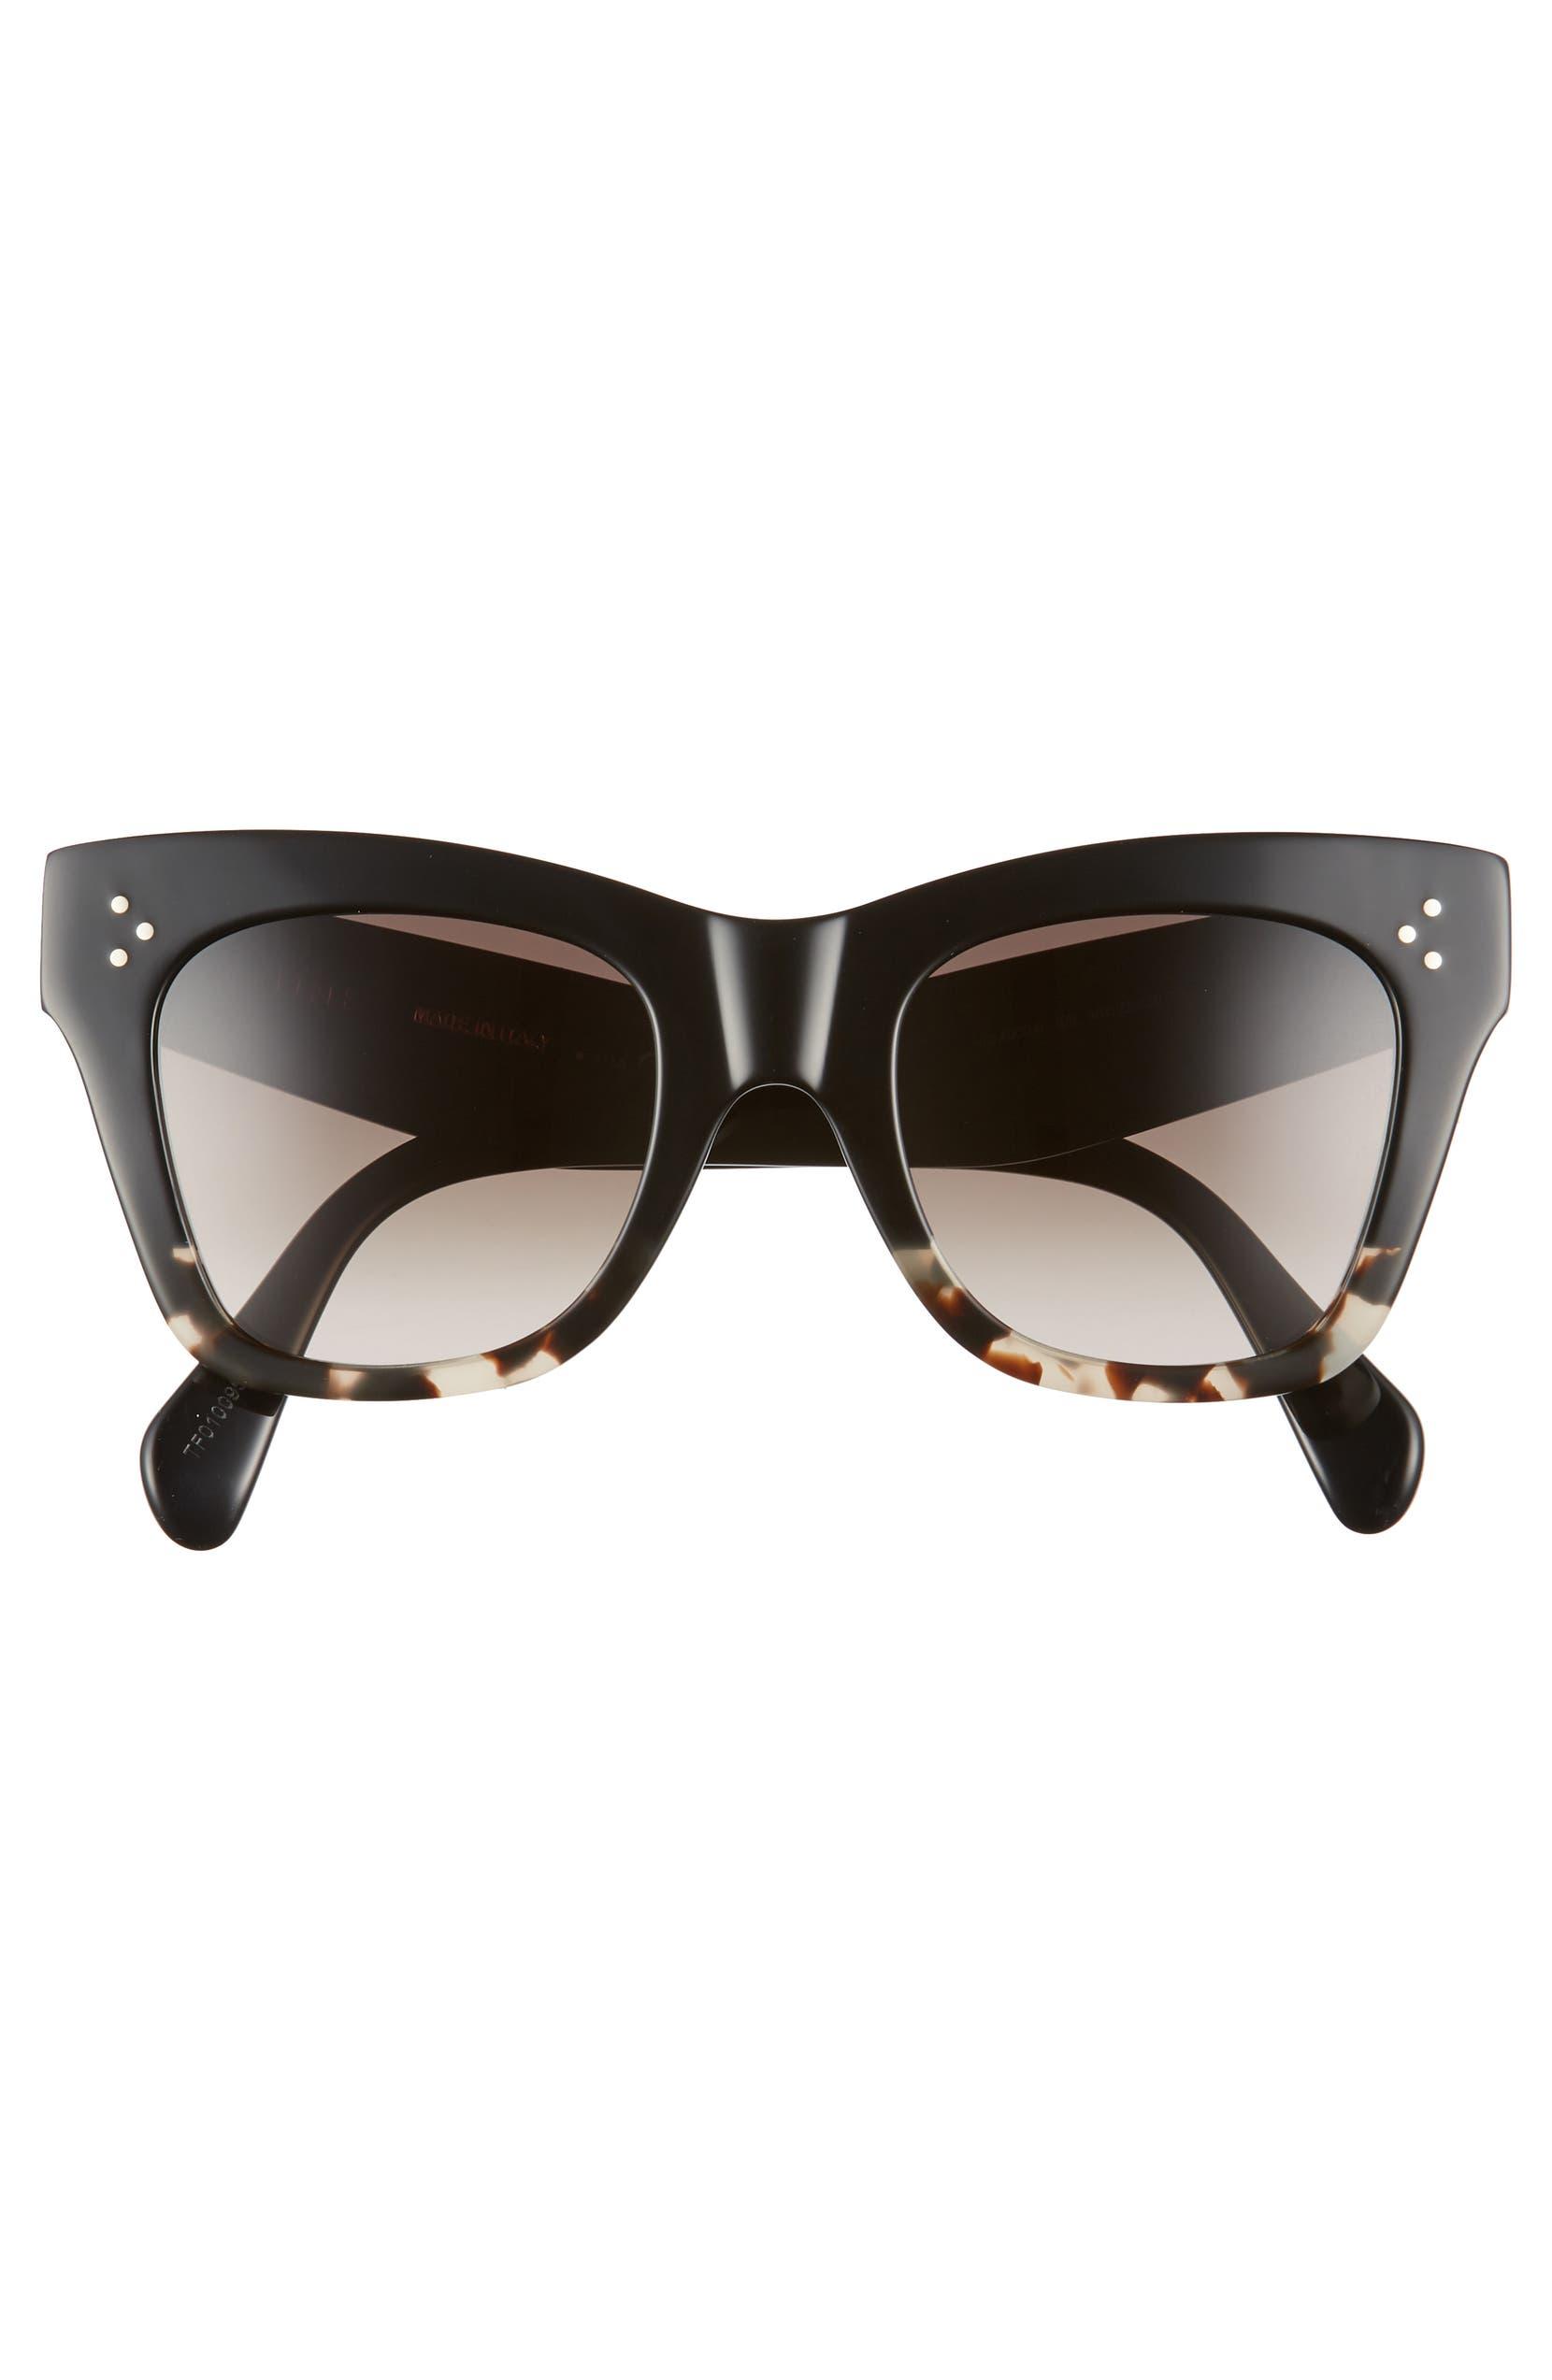 66c2c7f5ac7 CELINE 50mm Gradient Butterfly Sunglasses